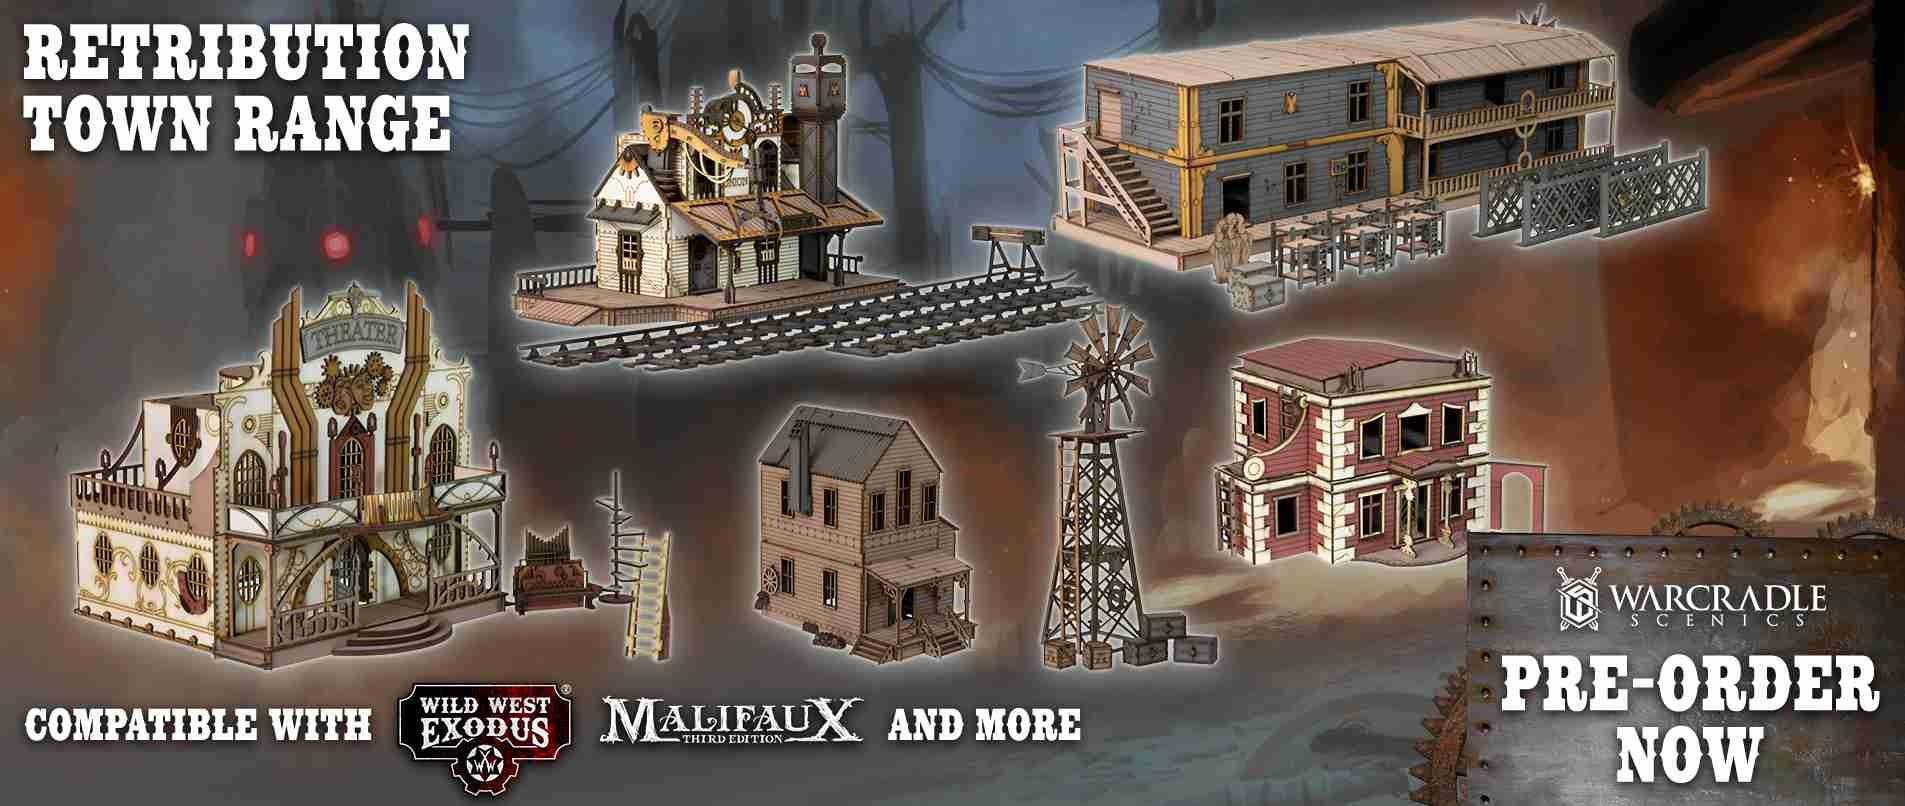 Warcradle Studios New Releases - Warcradle Distribution